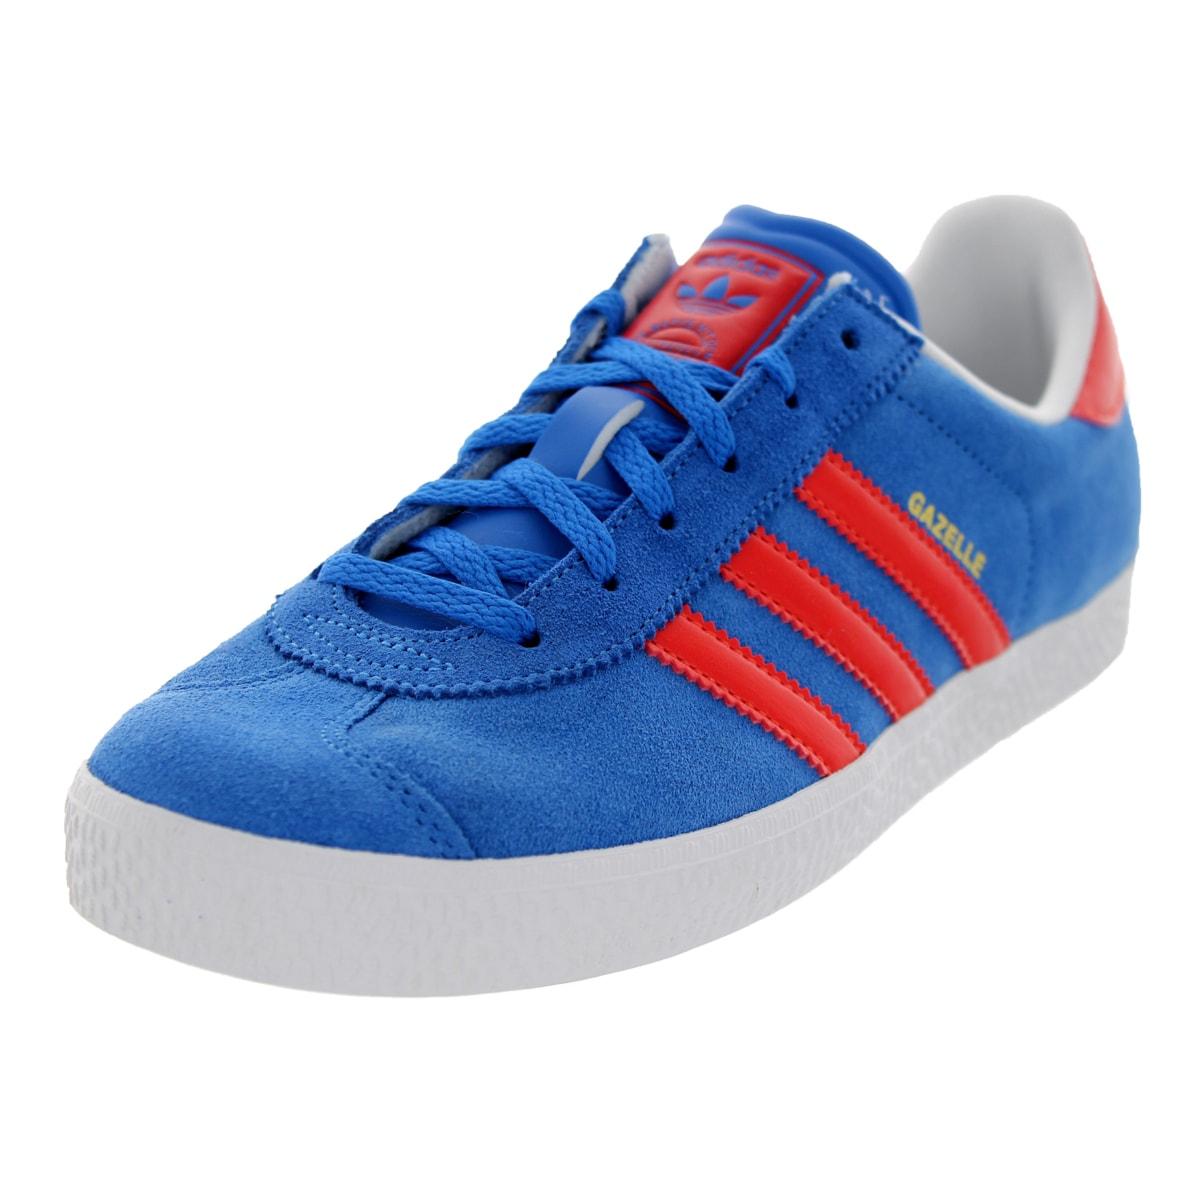 Adidas Kids' Gazelle 2 J Originals Blue